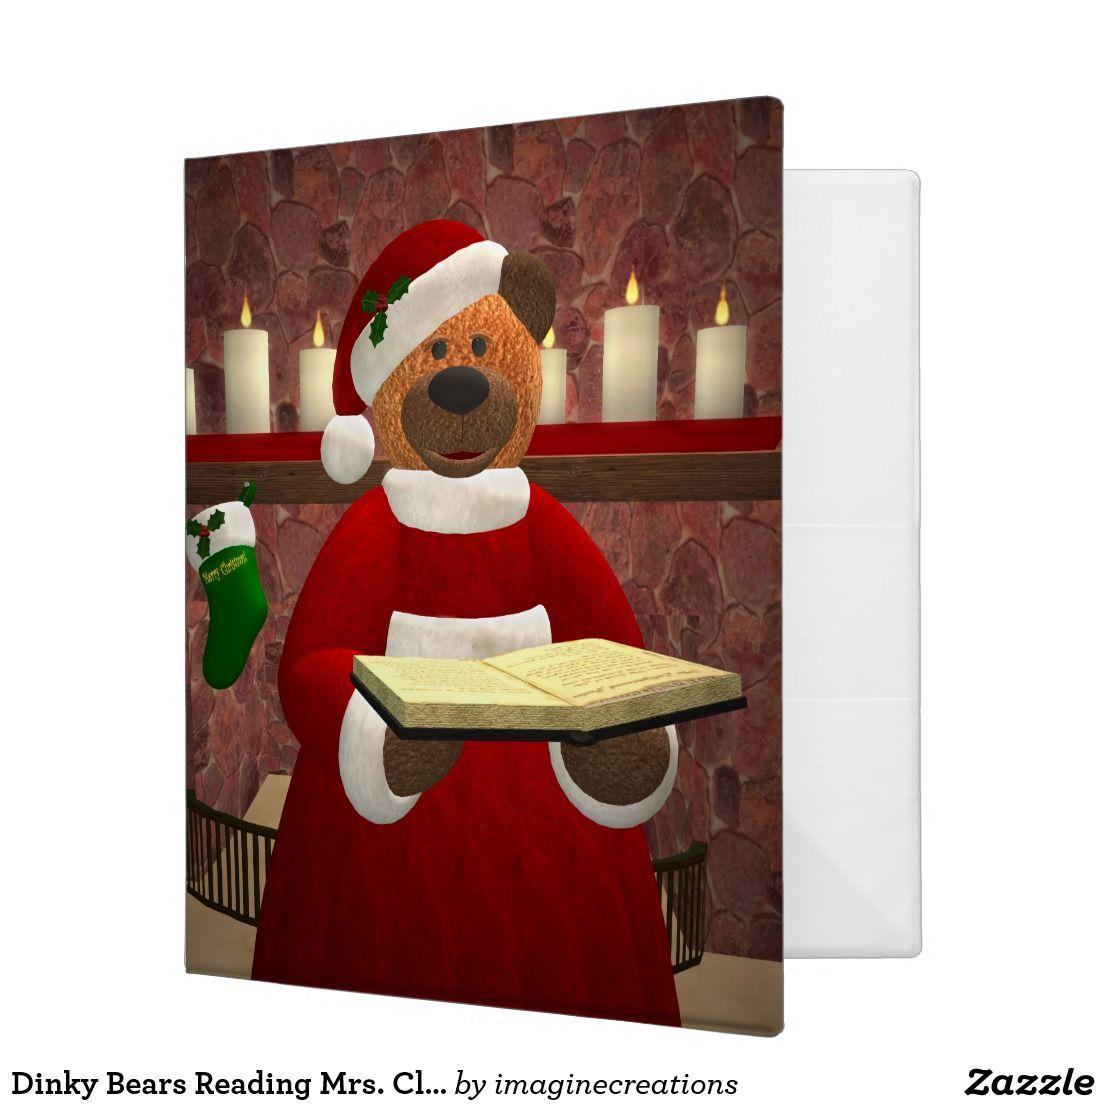 Dinky Bears Reading Mrs. Claus 3 Ring Binder